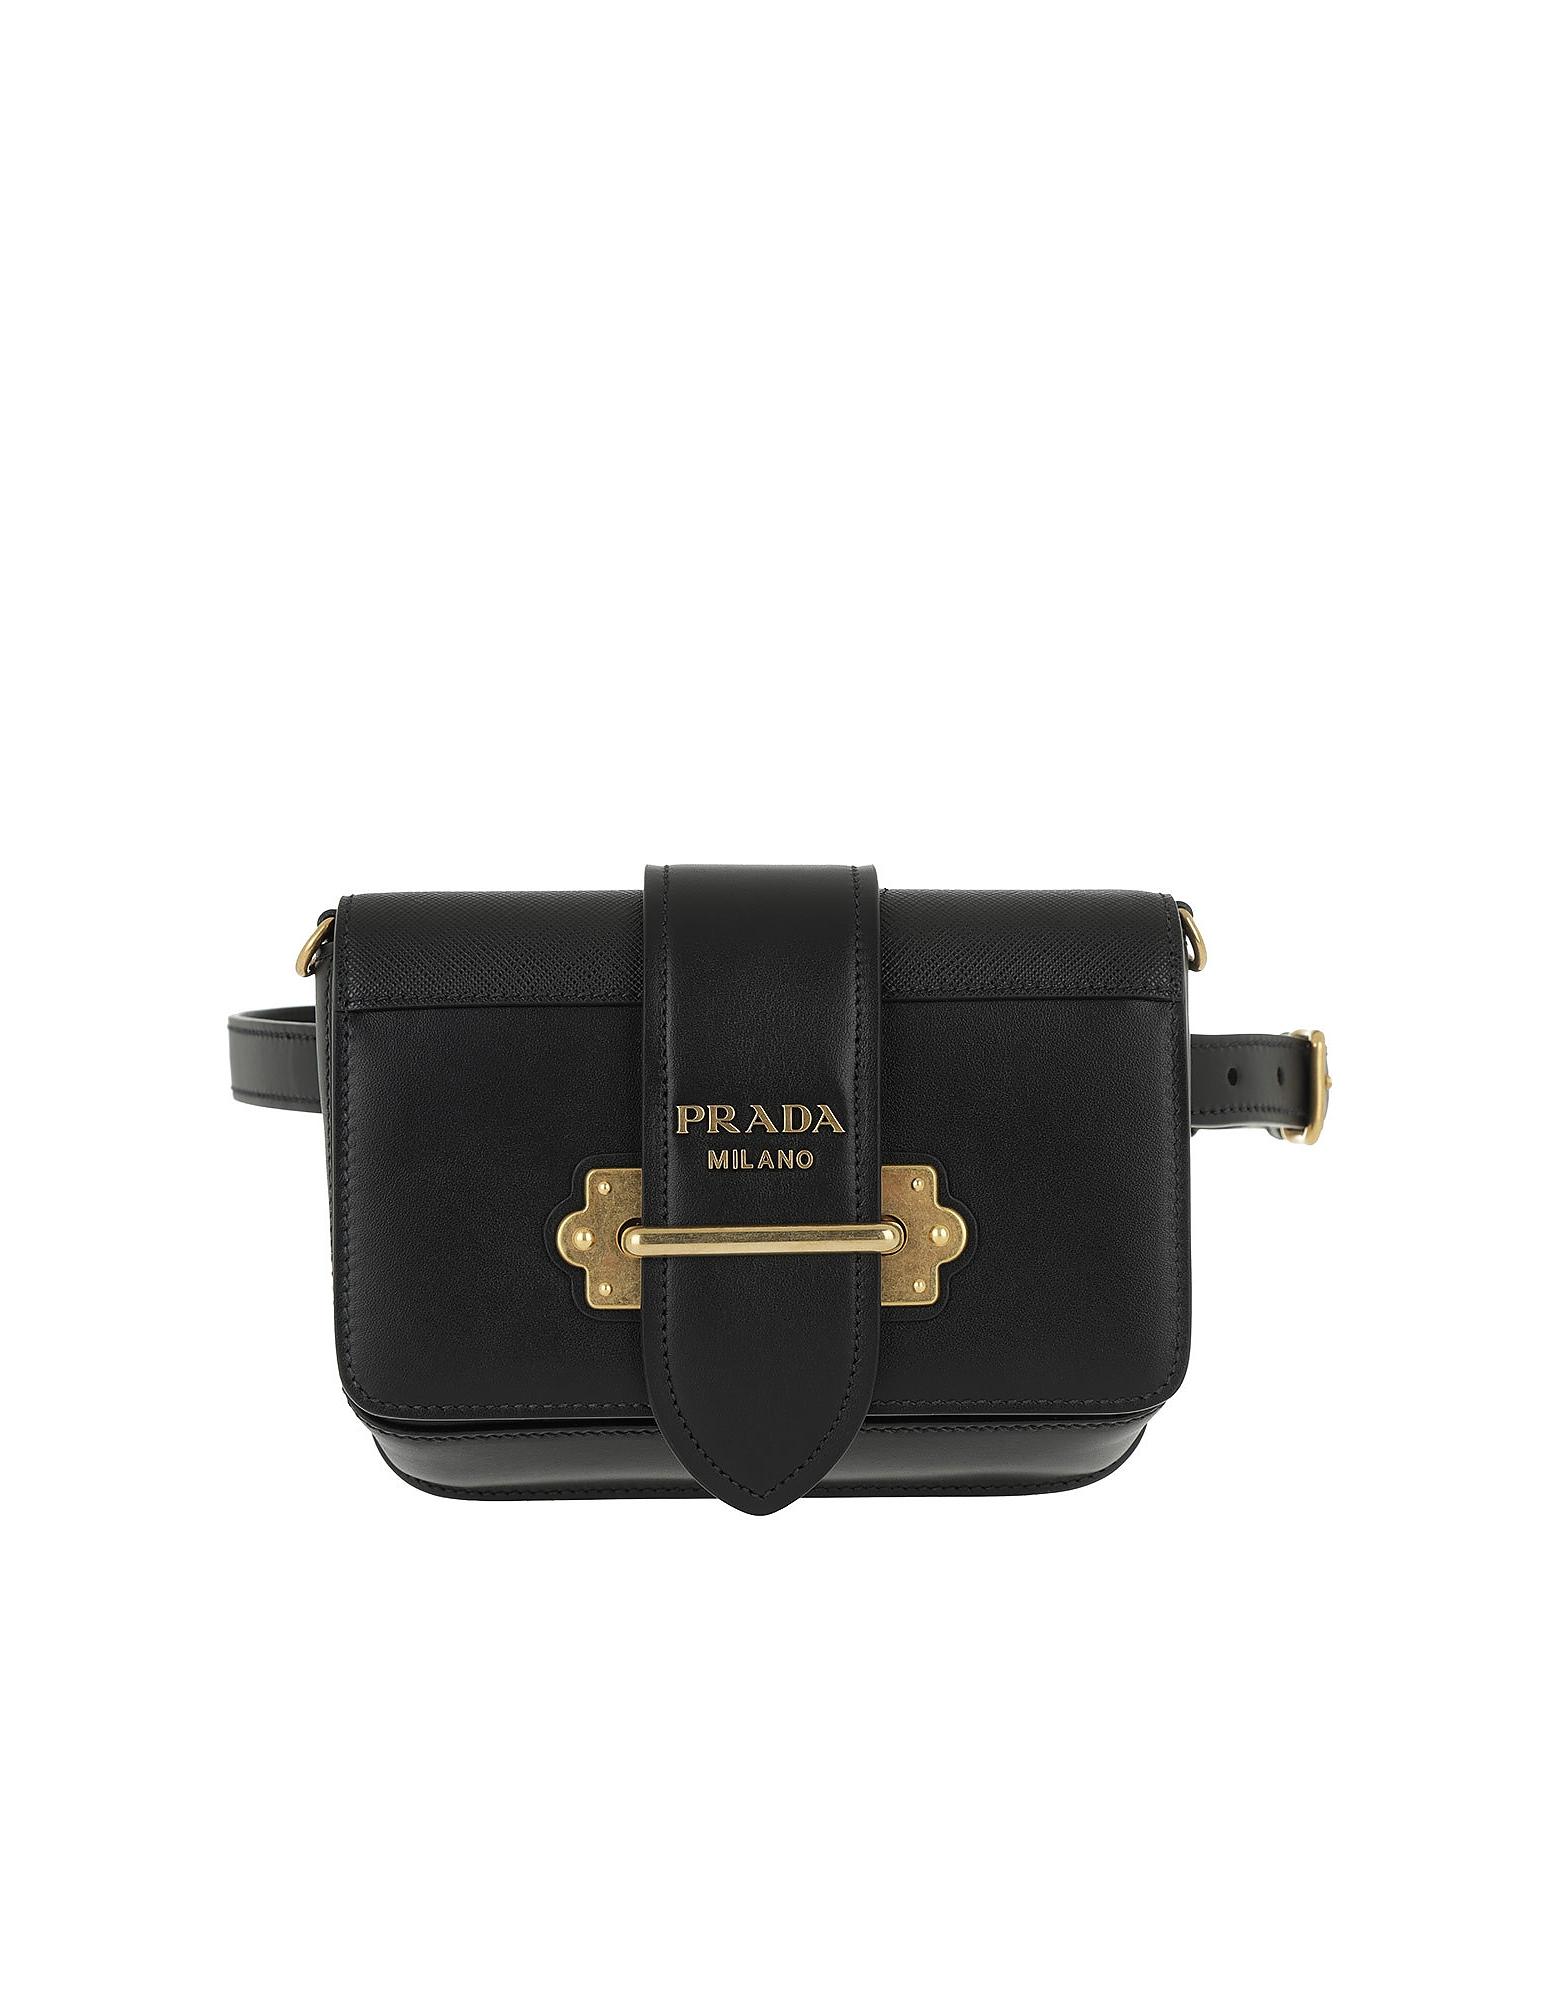 Prada Cahier Studded Belt Bag Leather Black  49b2591168166